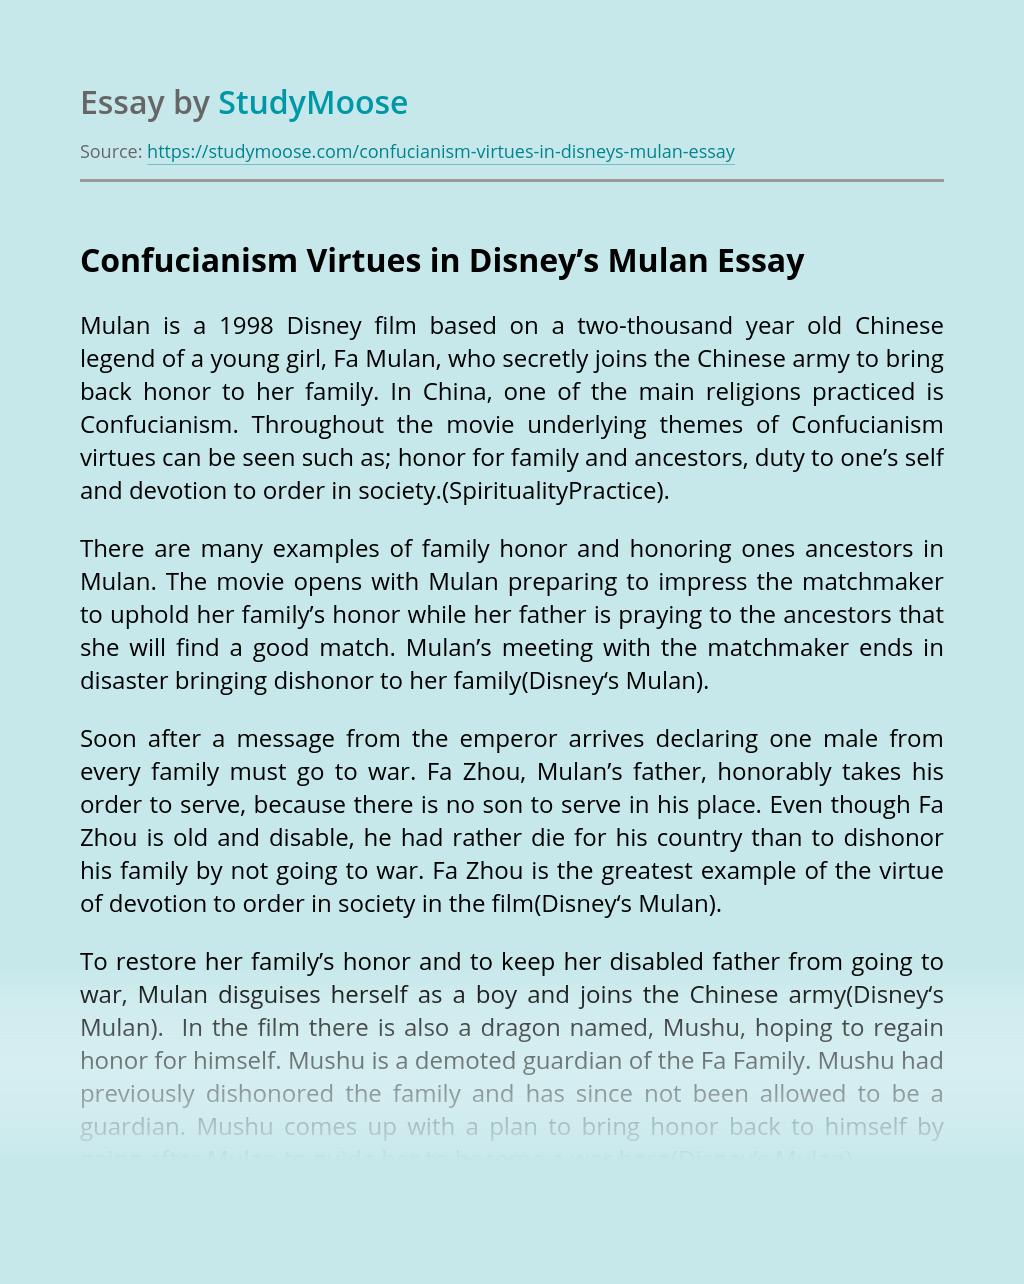 Confucianism Virtues in Disney's Mulan